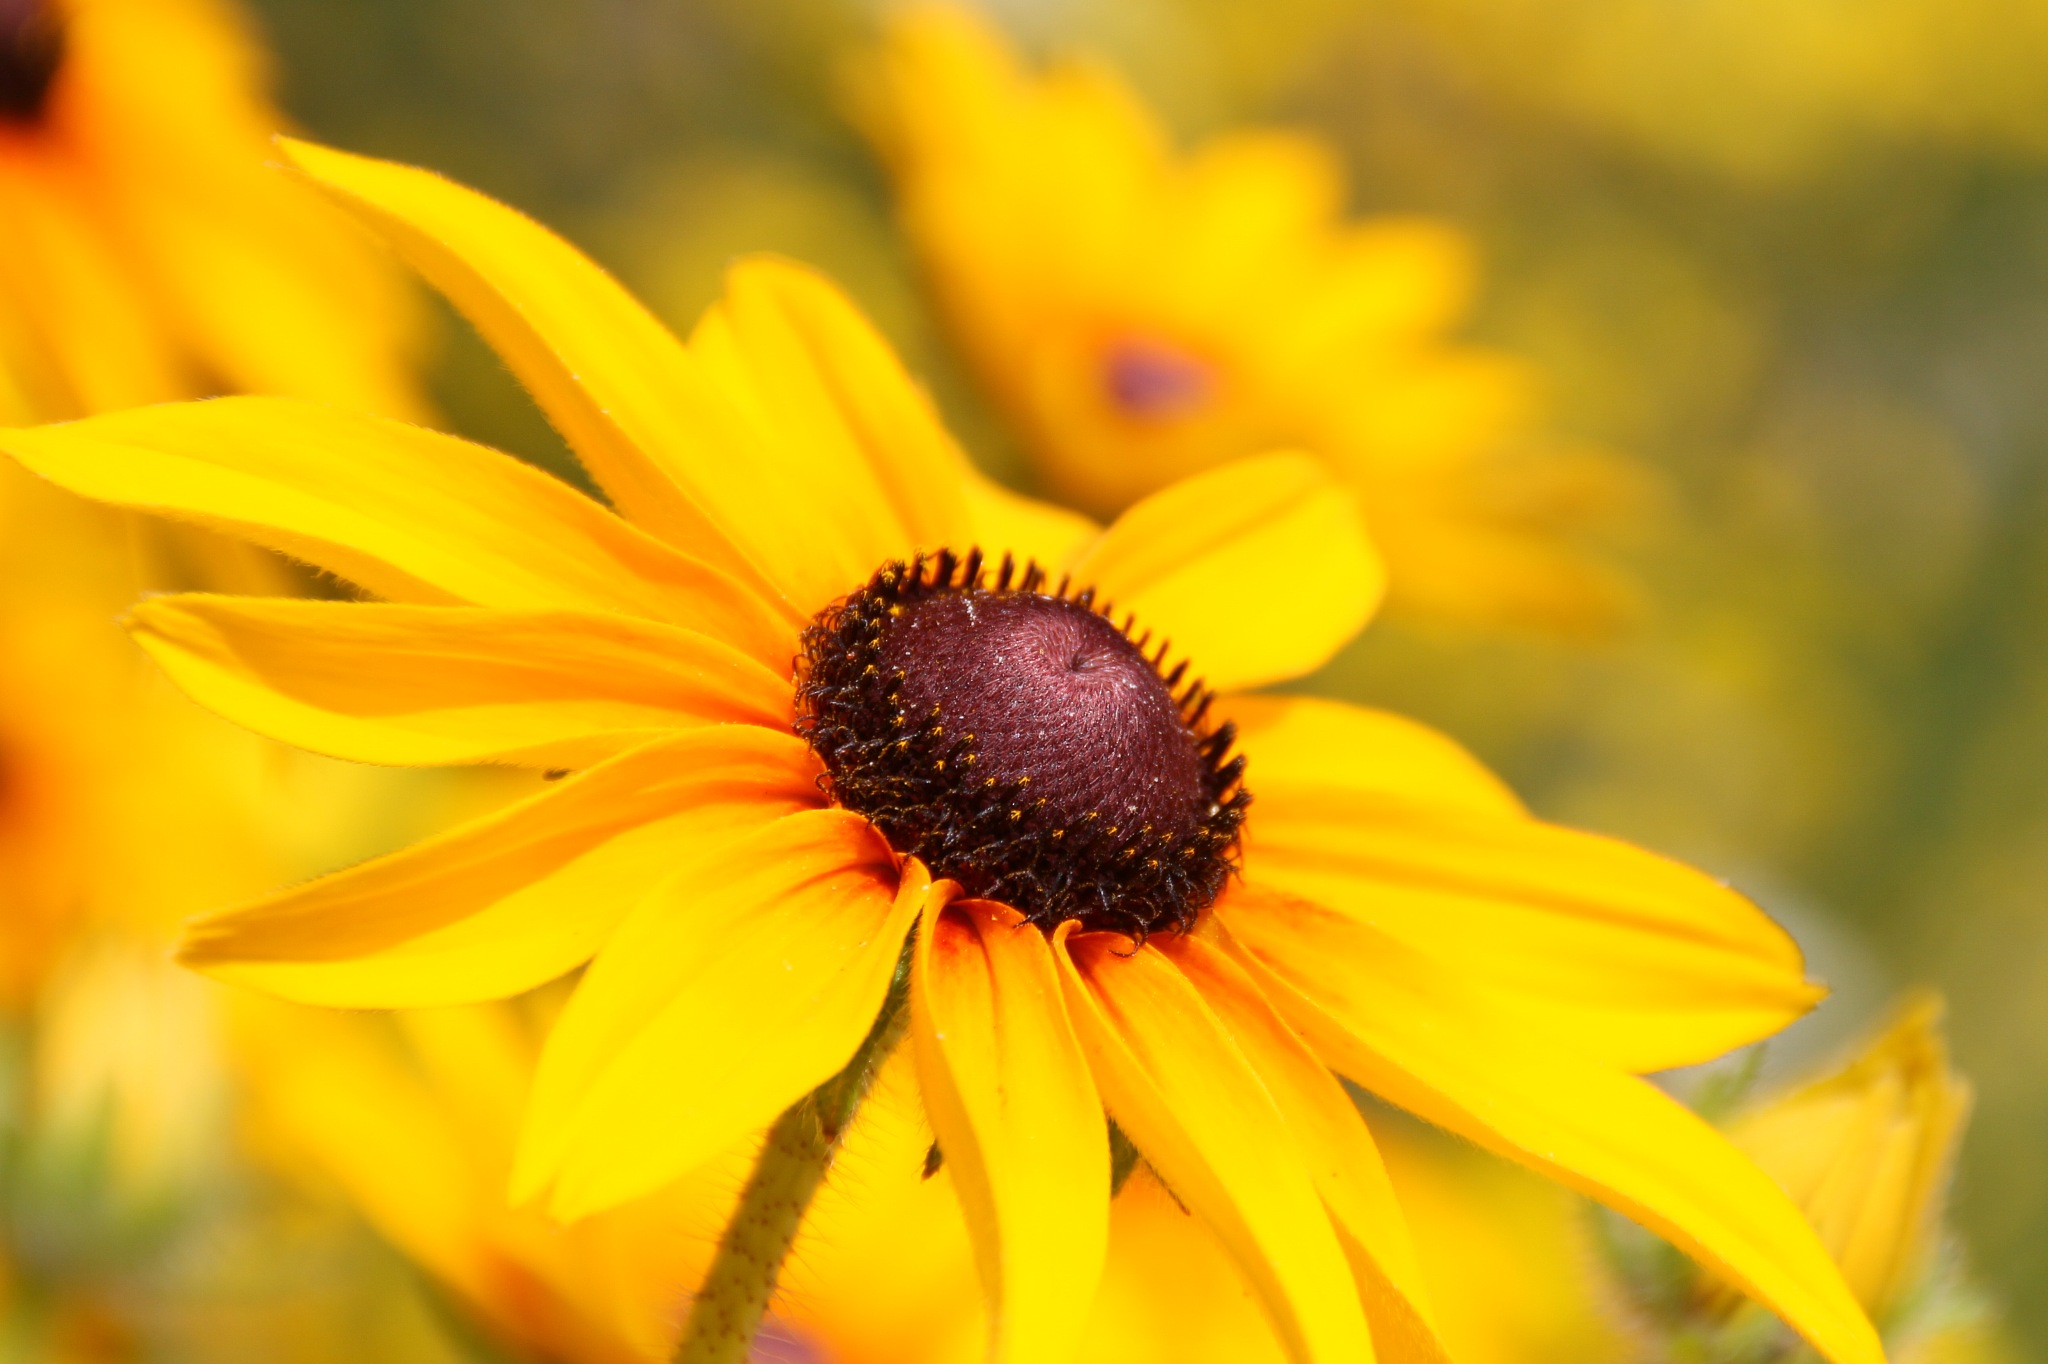 yellow flower by sonjajonkhout